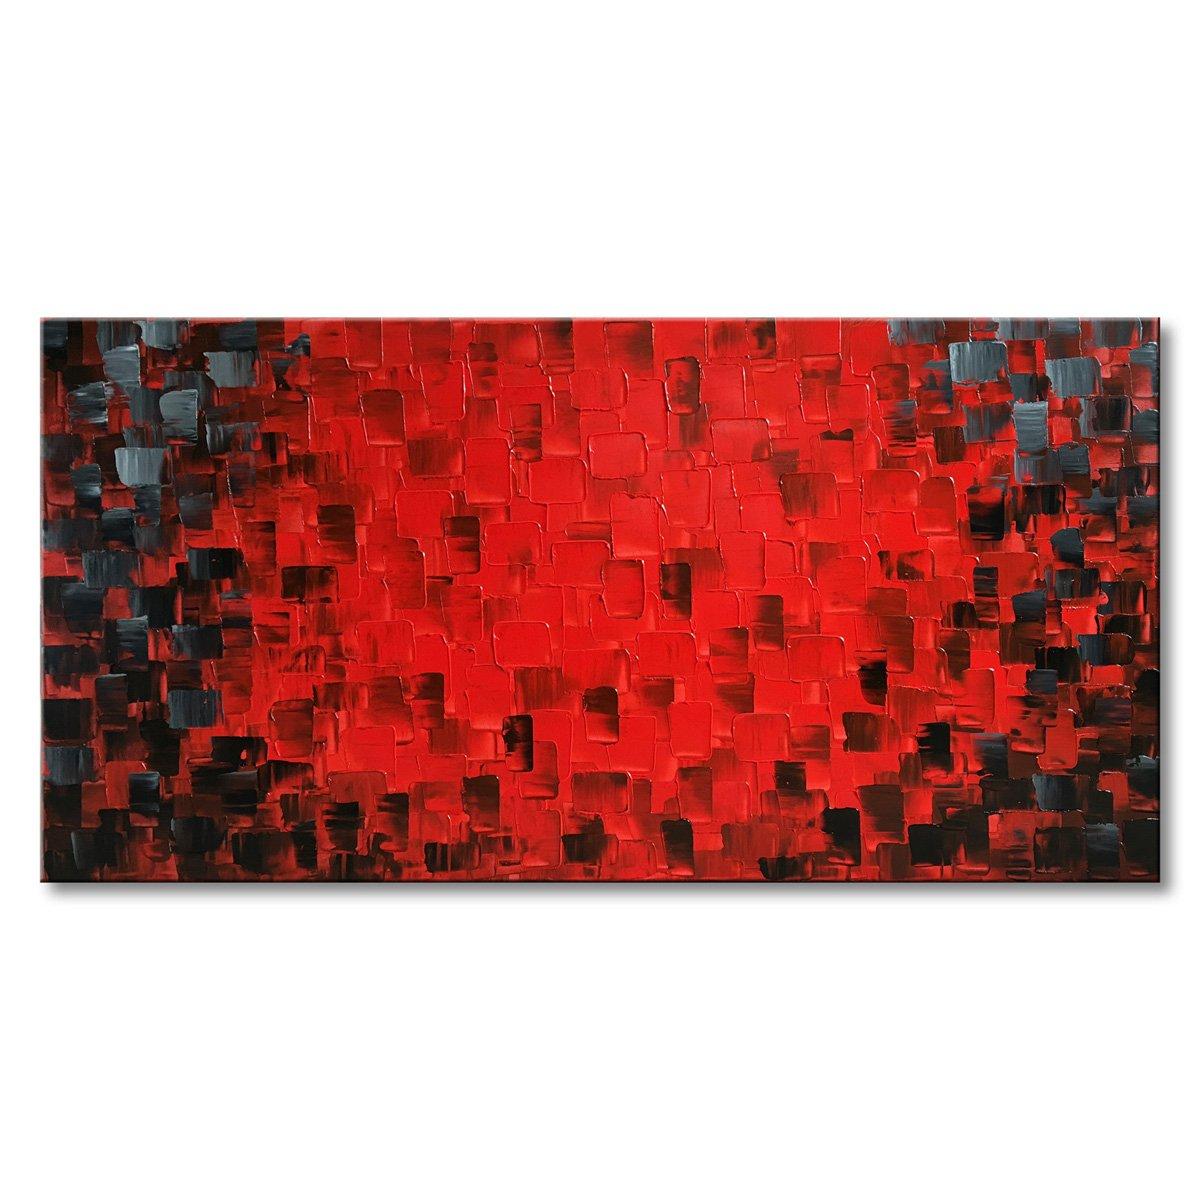 Seekland art modern texture oil painting handmade canvas red abstract wall art wall decoration artwork no